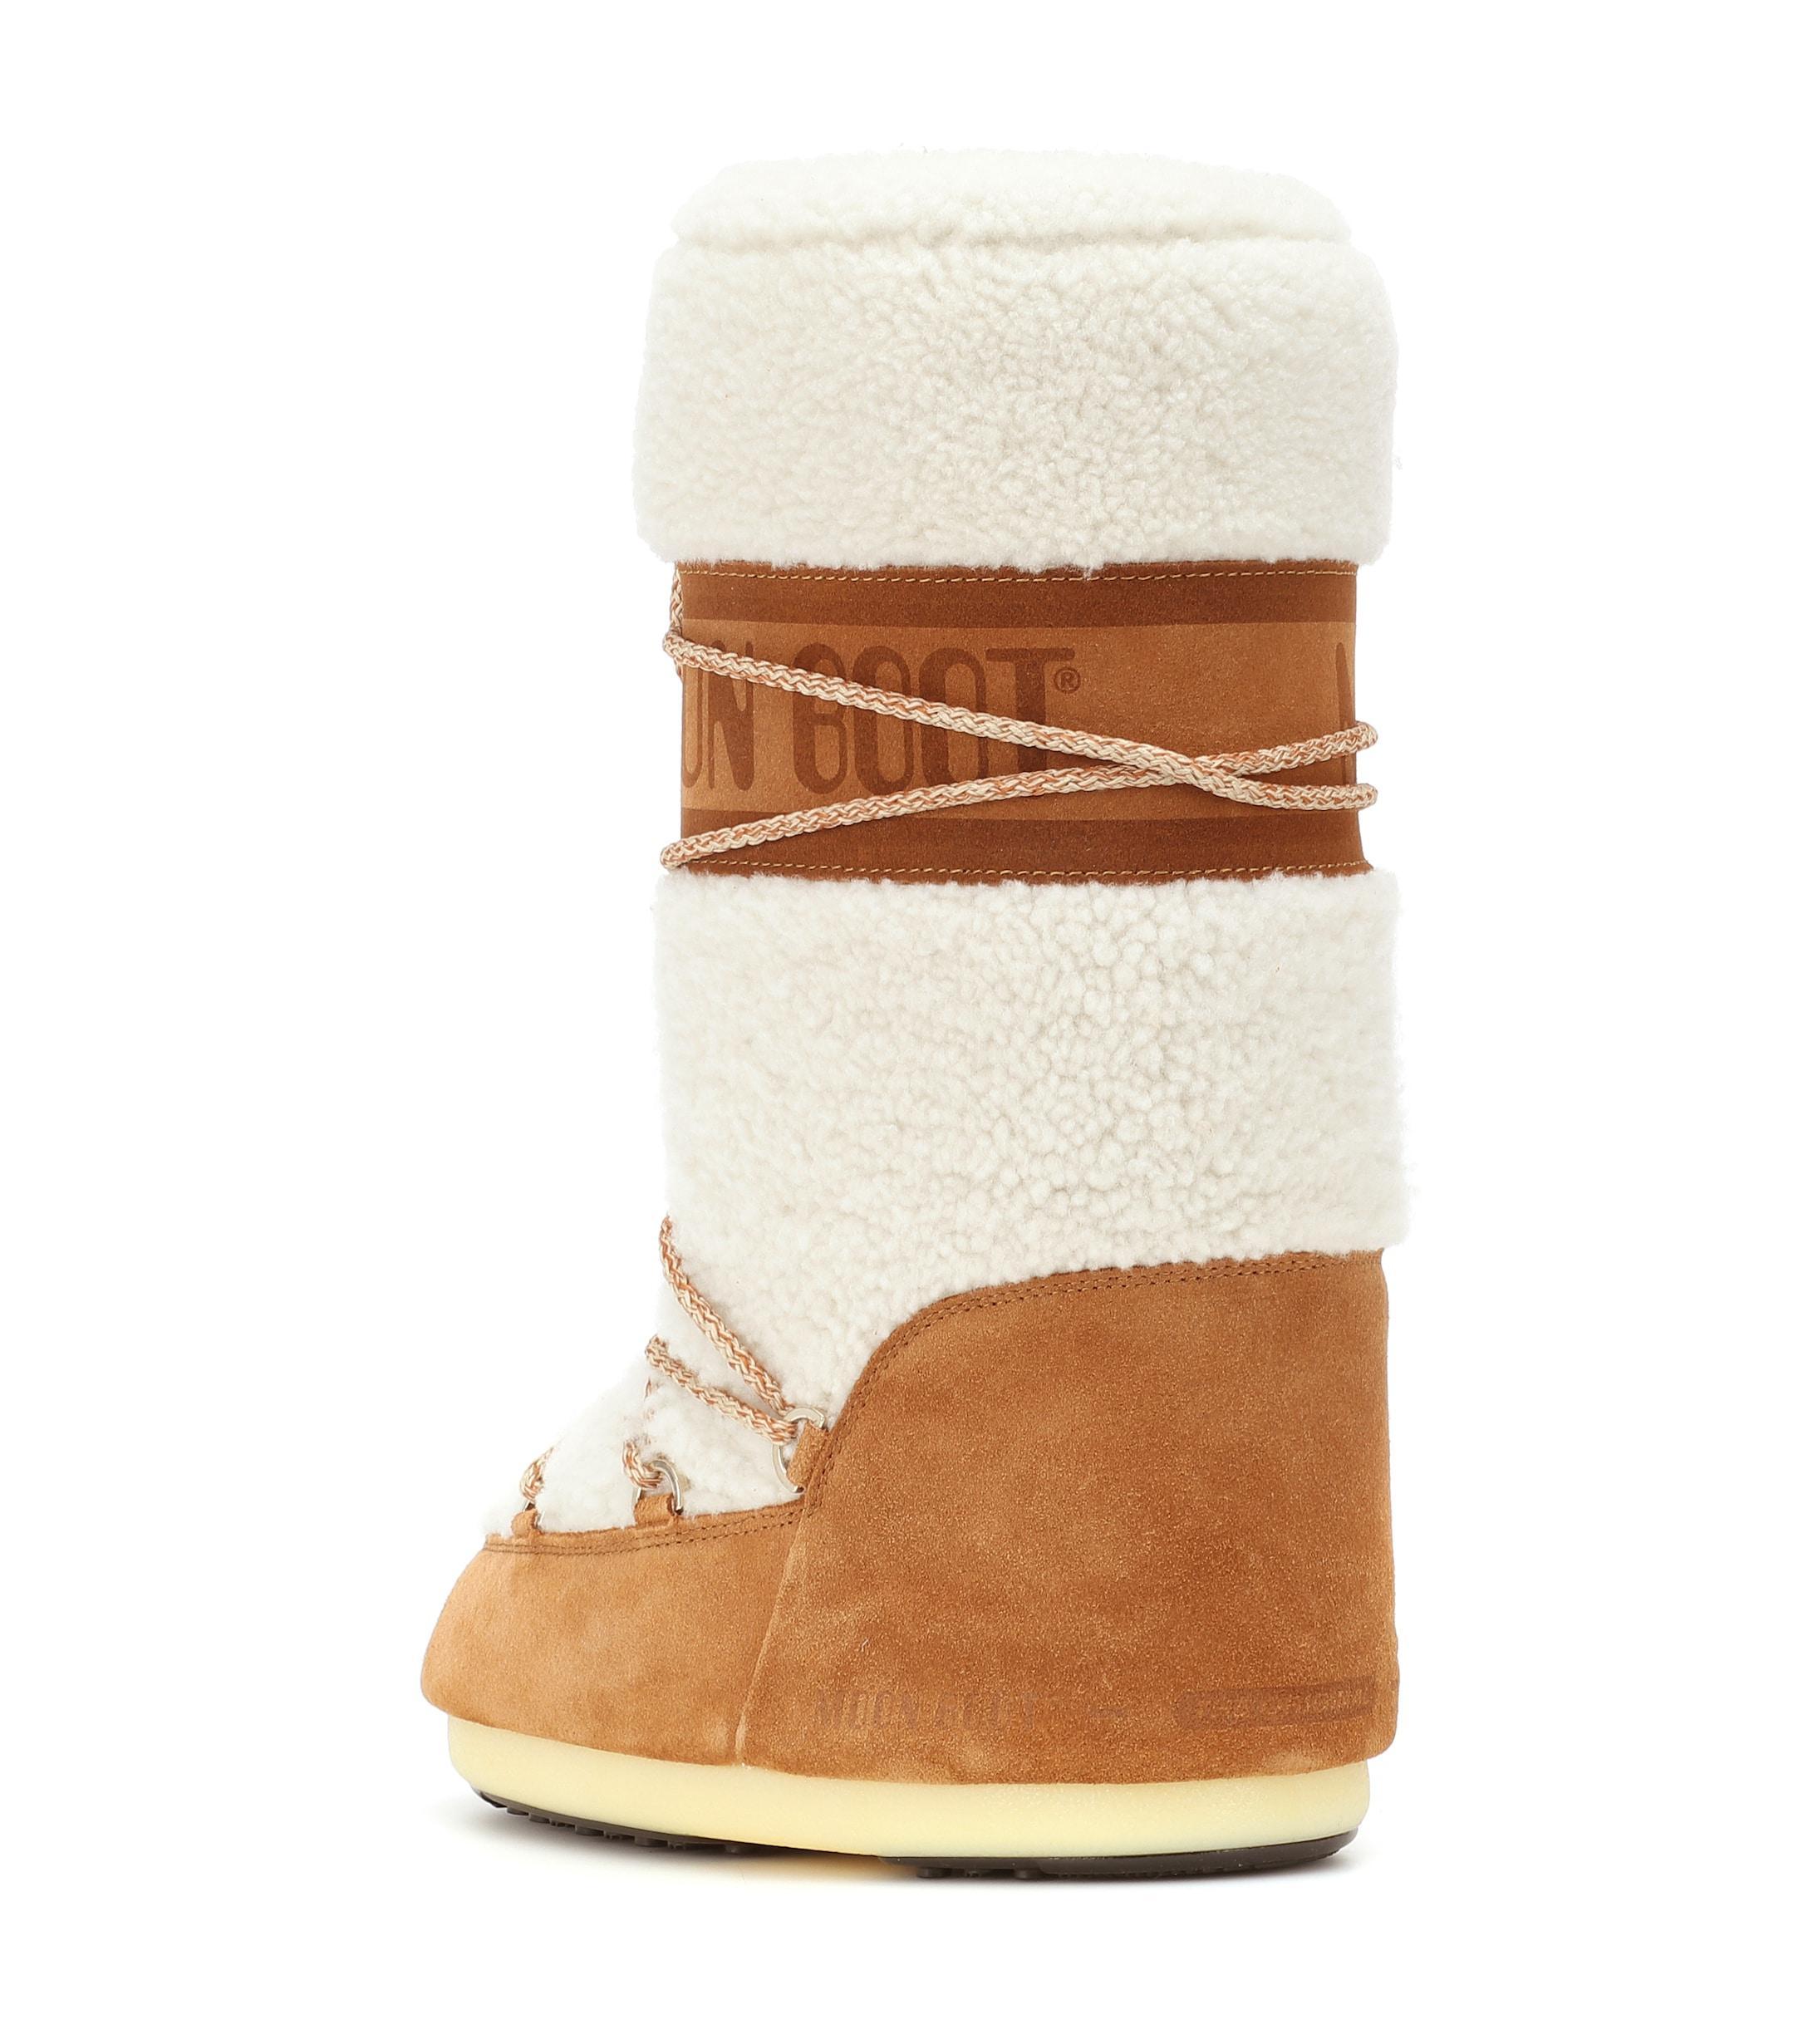 Bottes Wool en daim et shearling Moon Boot en coloris Neutre